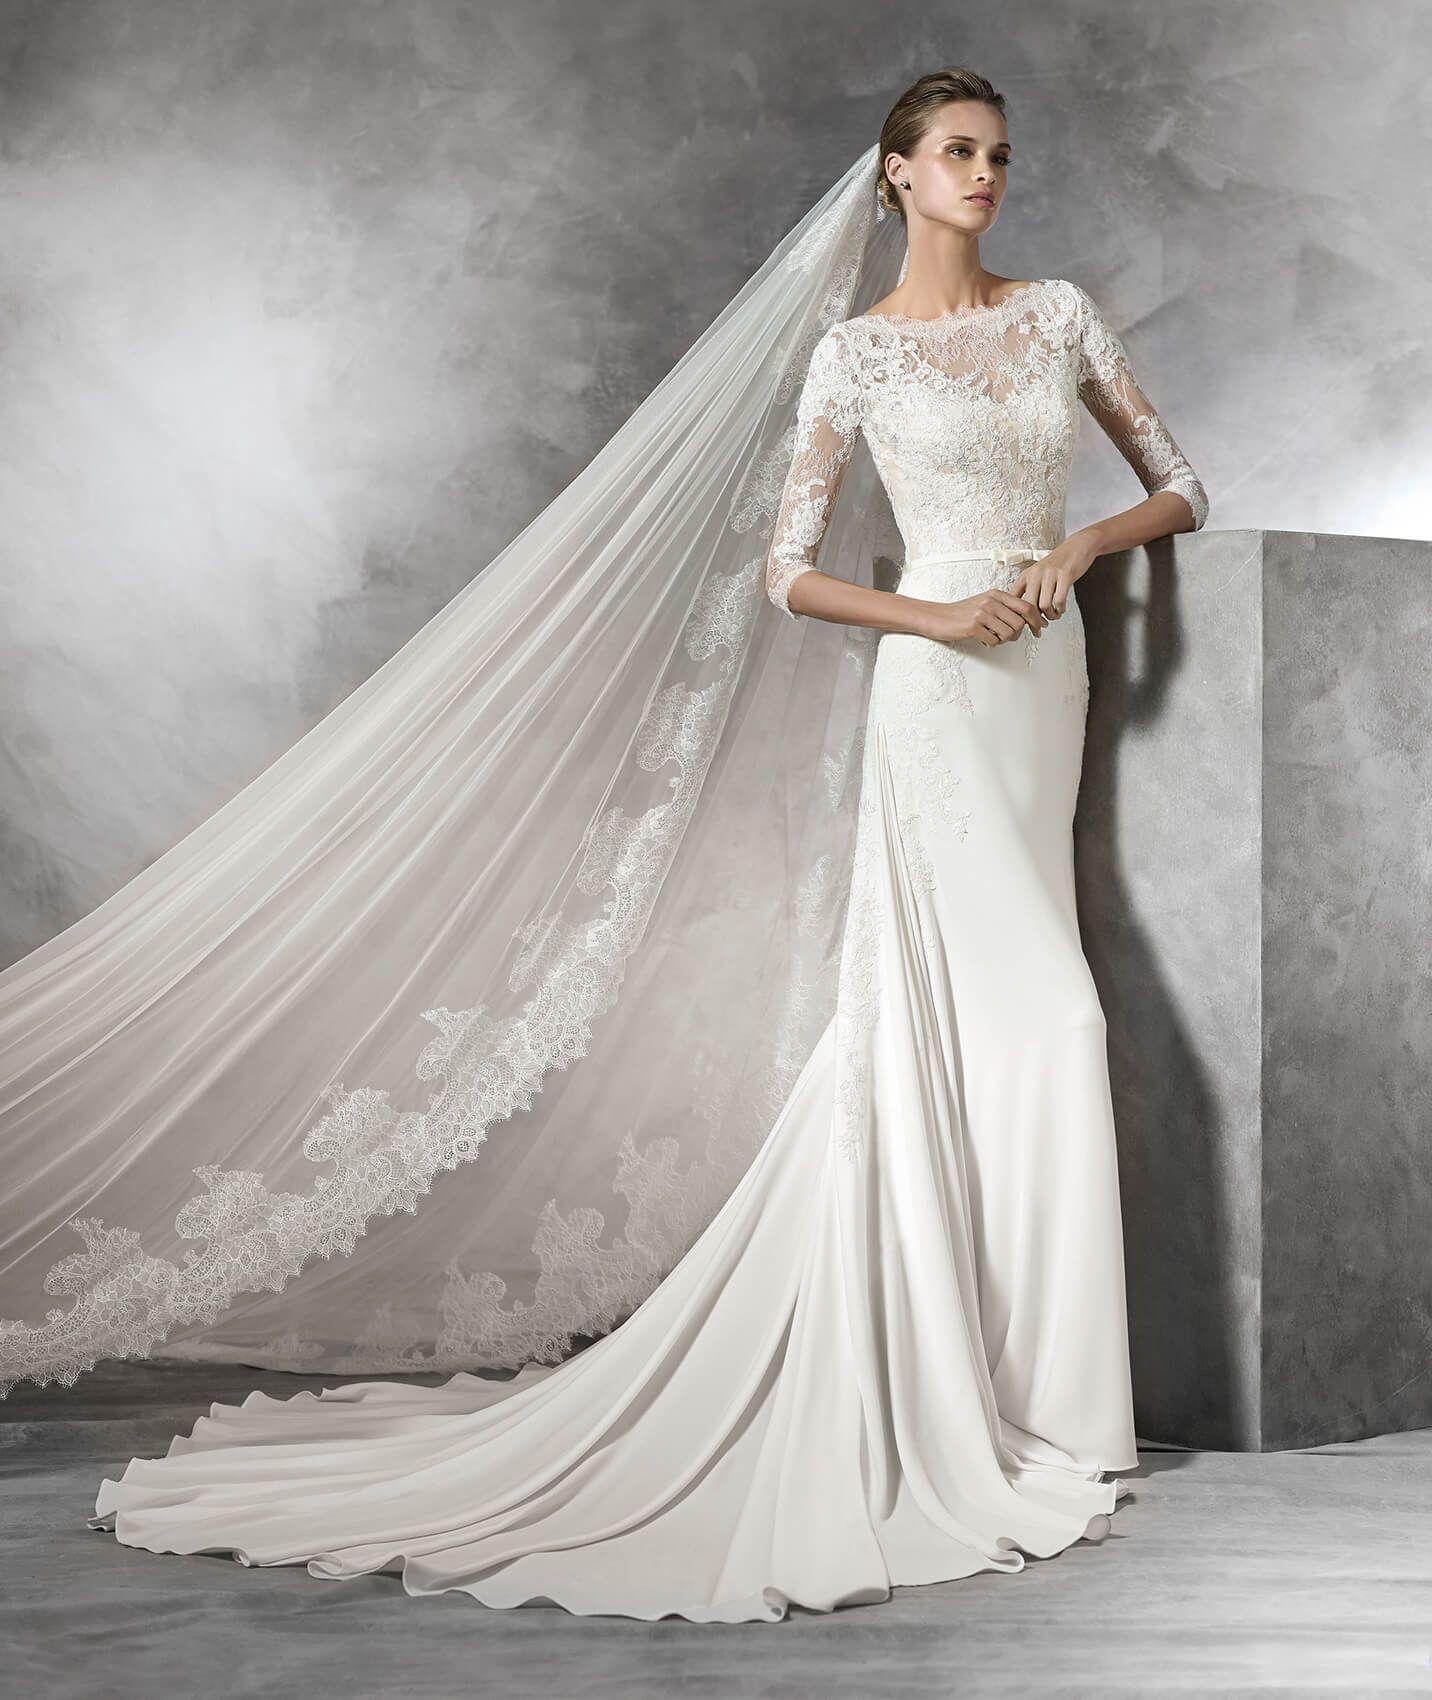 735183650a41 Pronovias Style Tane Sz. 12 Natural Off/White Crepe Original Price $1700 SA  Price $1200